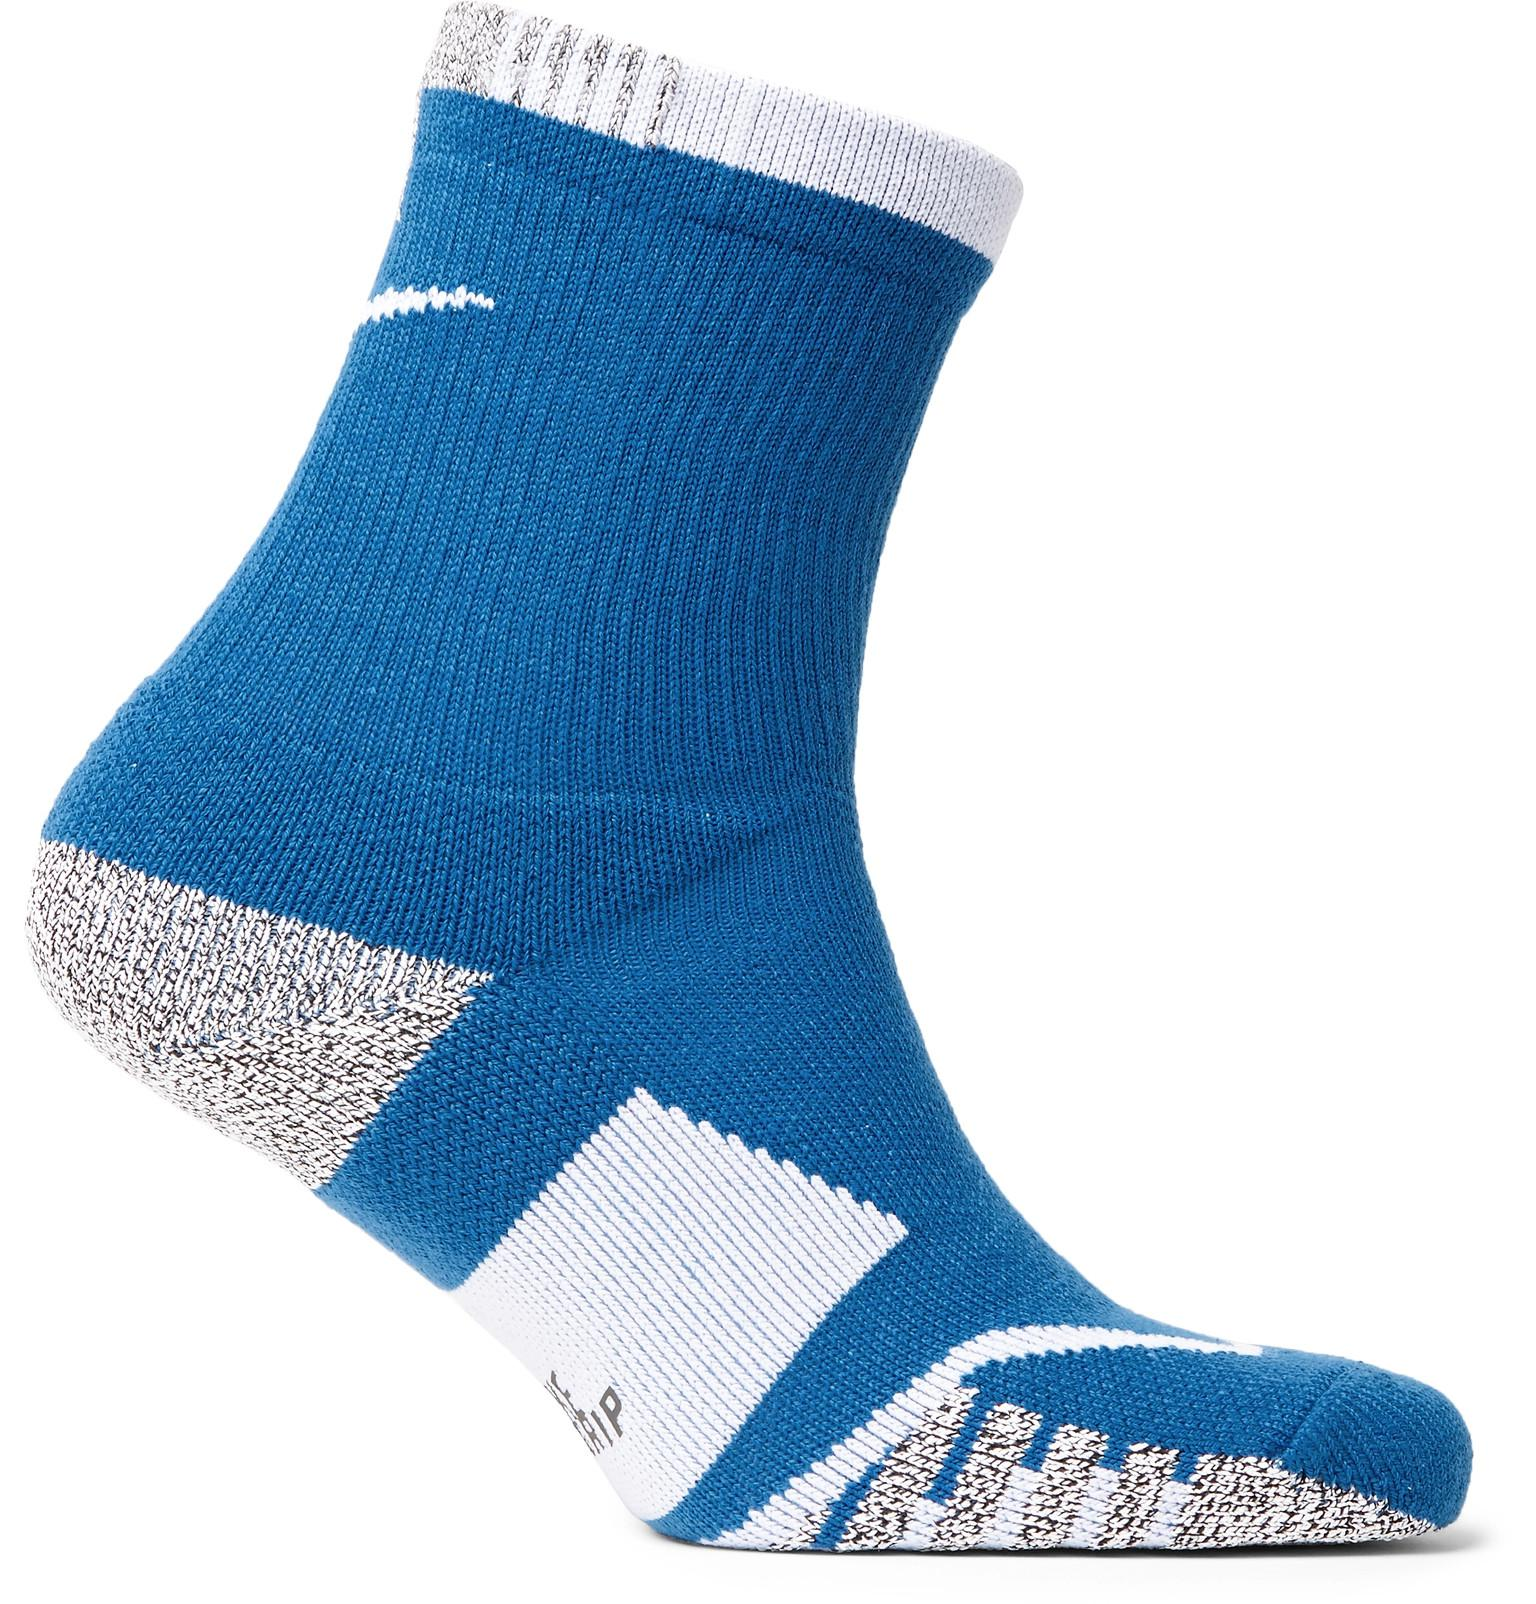 70c2f6535 Nike Nikegrip Elite Crew Dri-fit Tennis Socks in Blue for Men - Lyst